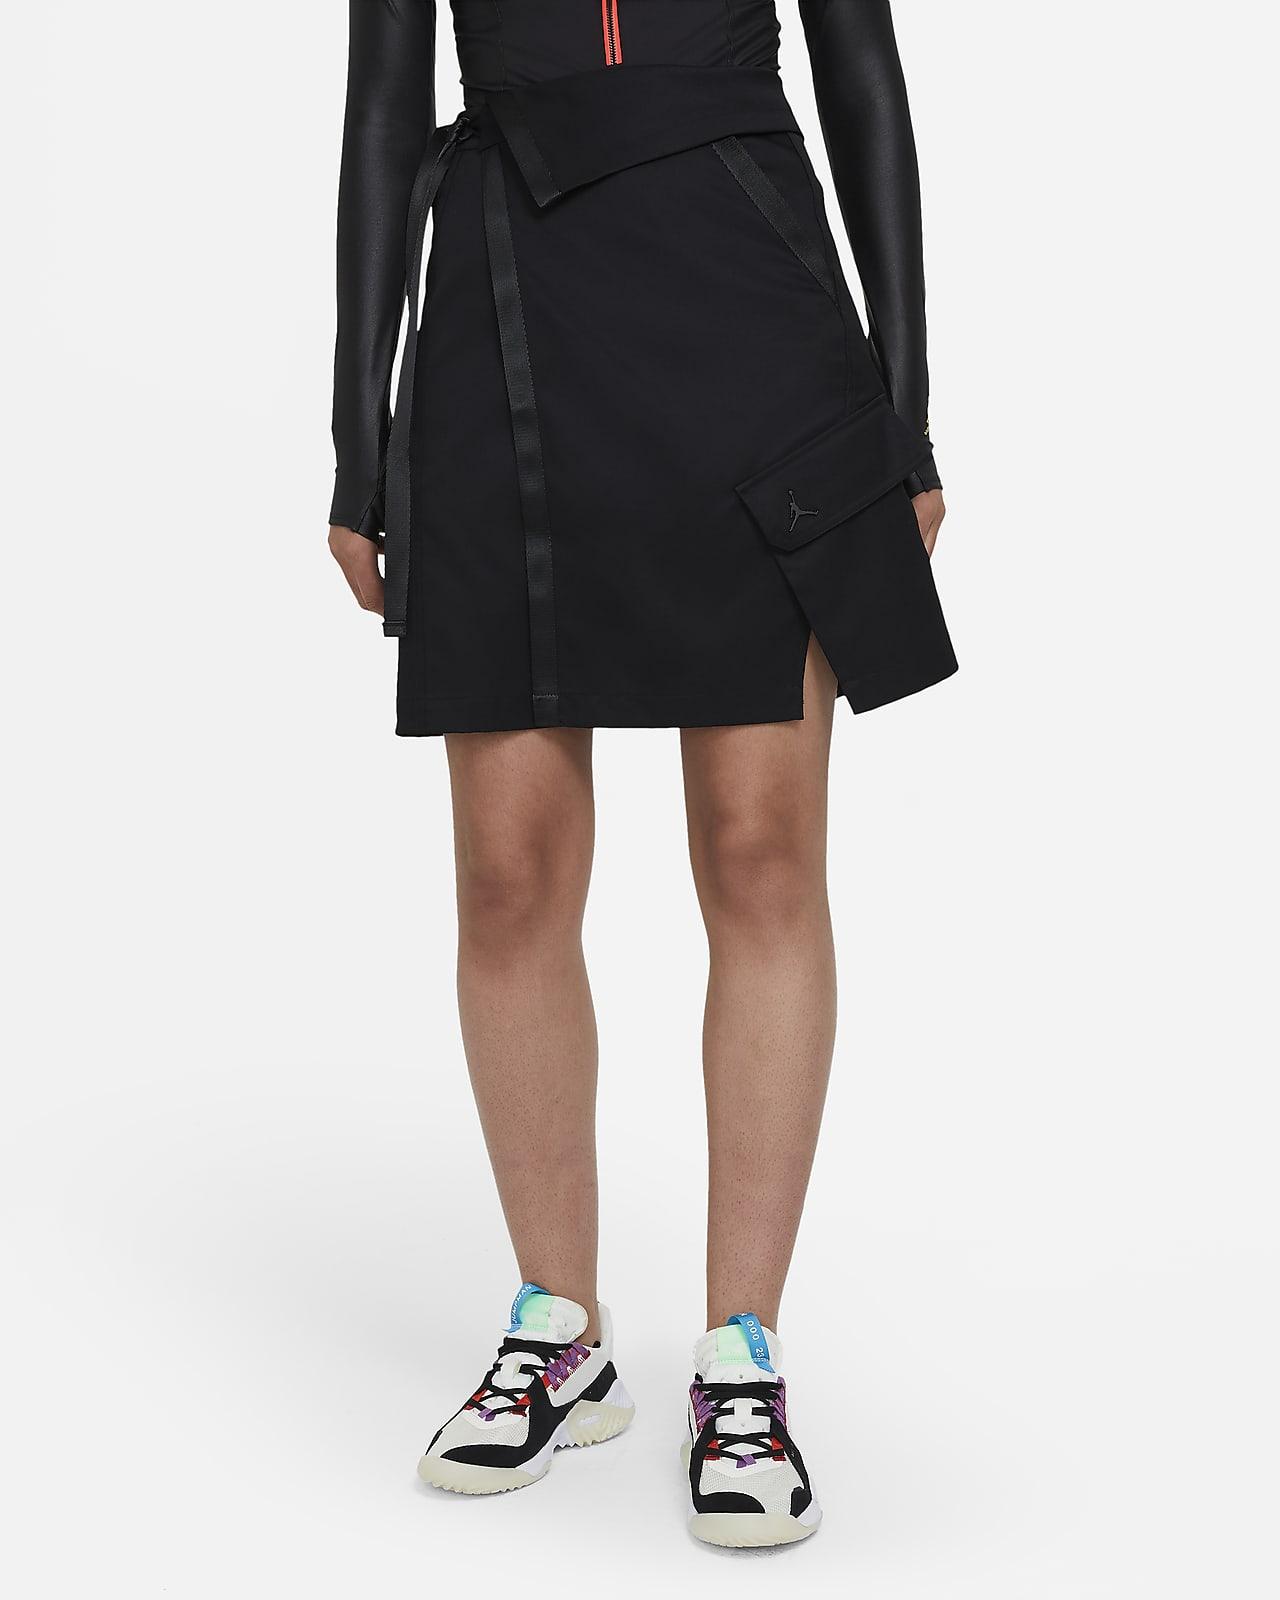 Jordan Future Primal Women's Utility Skirt